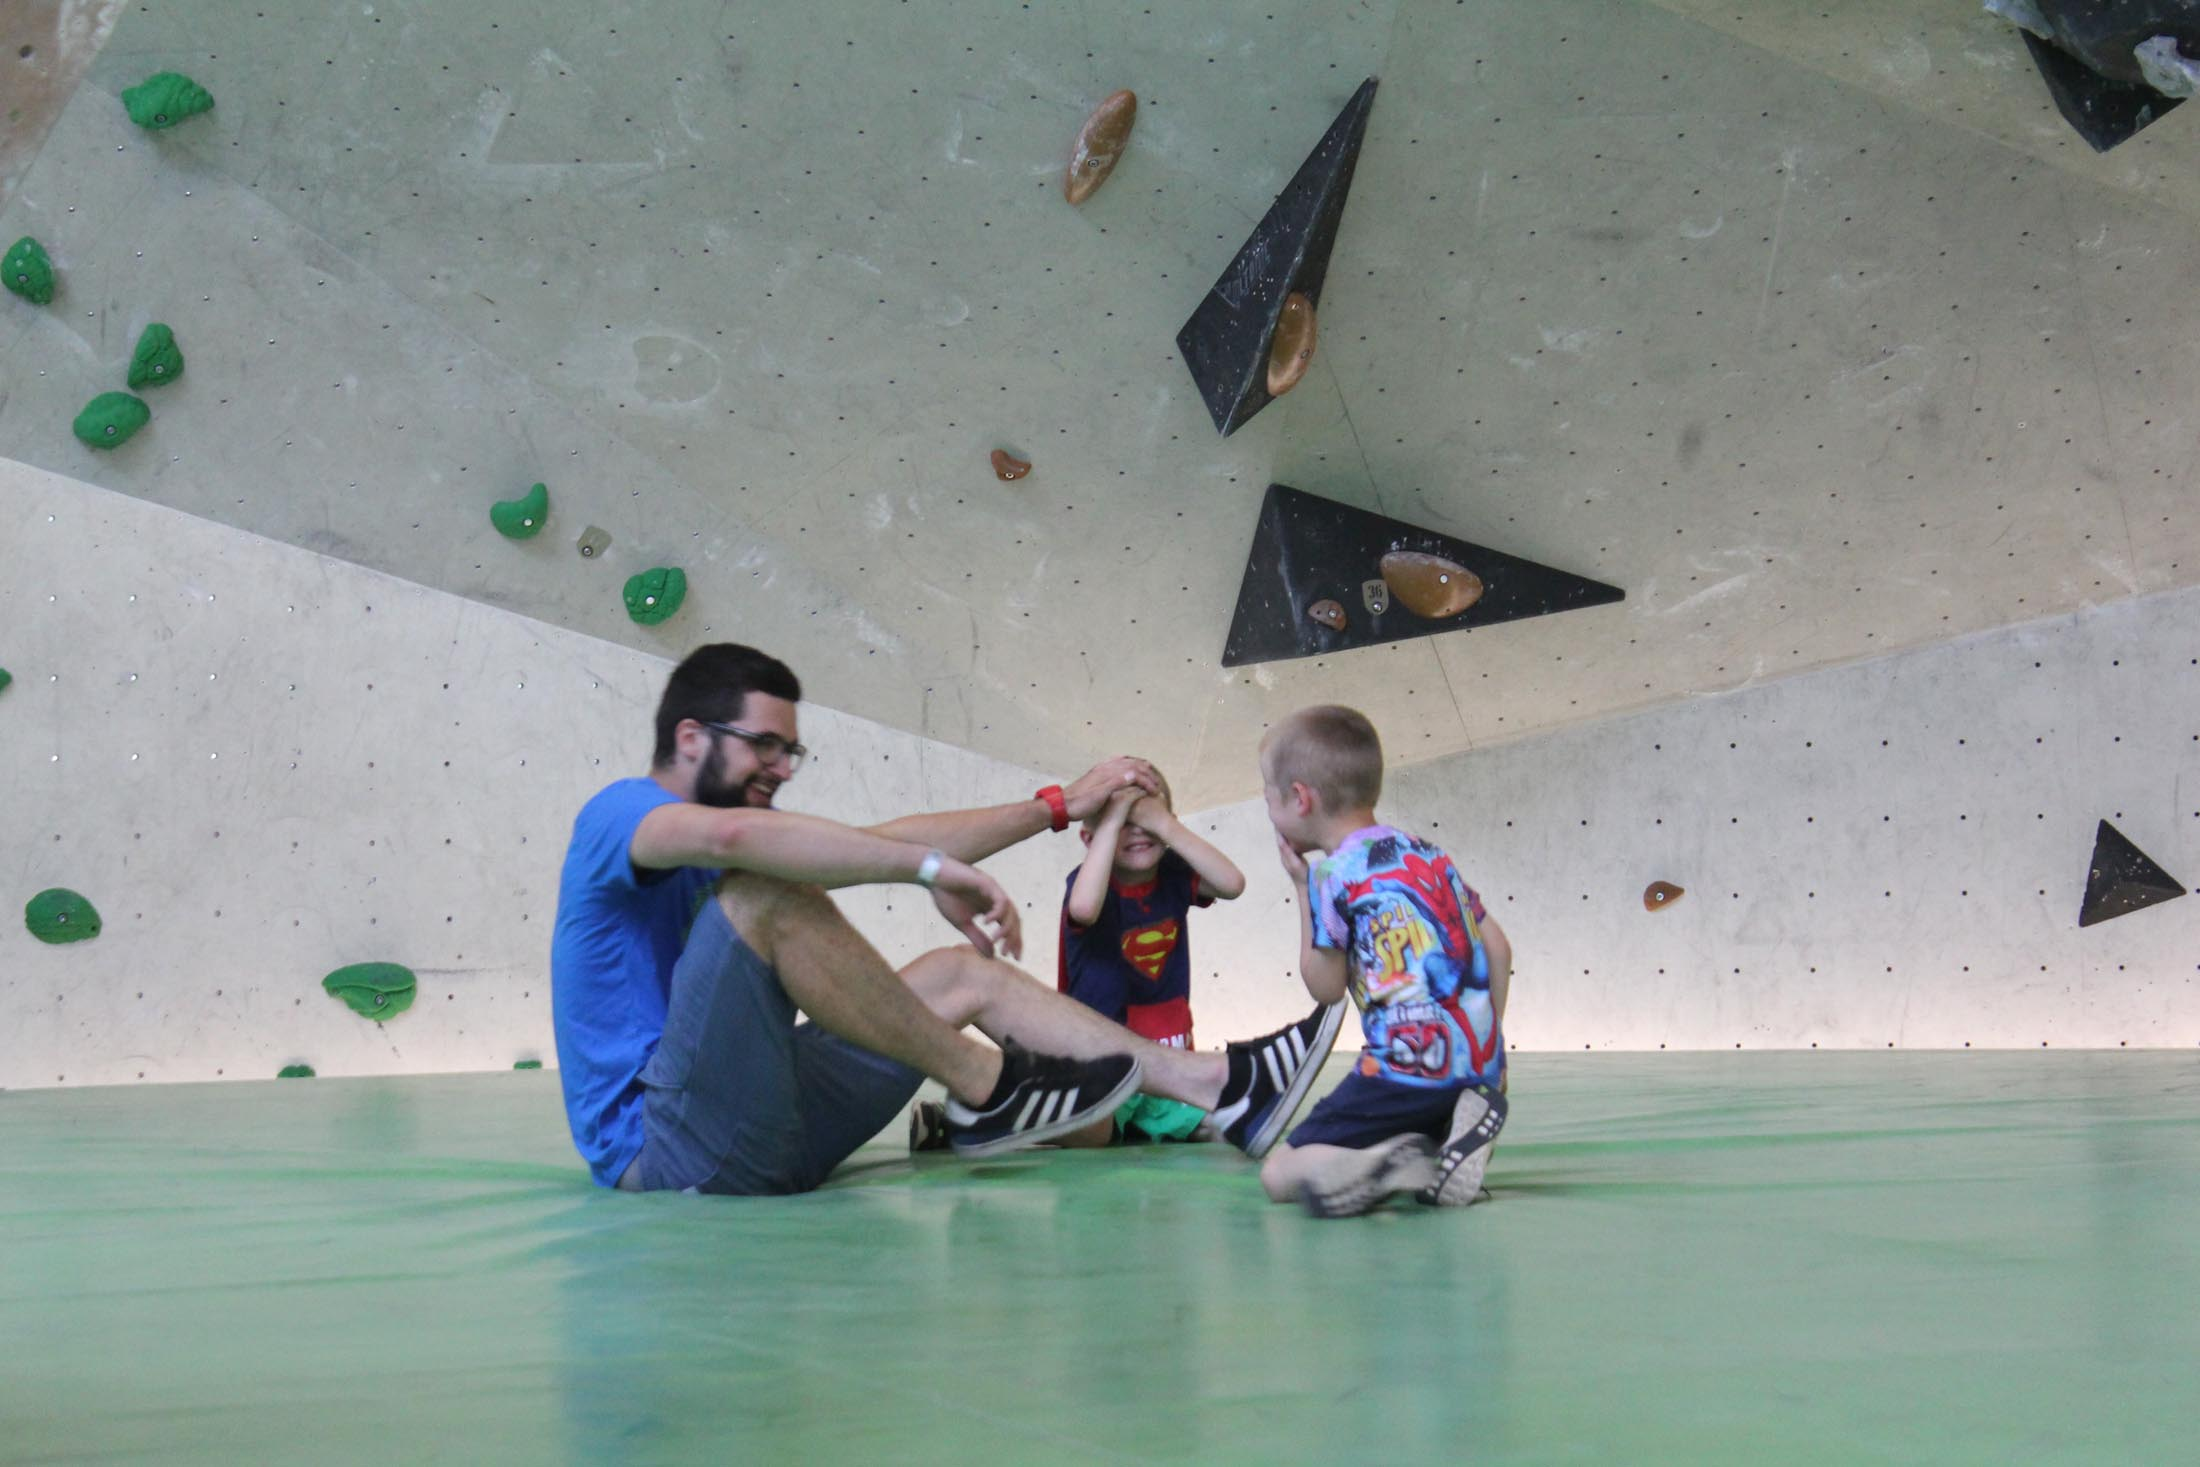 Registration internationaler bouldercup Frankenjura 2016, BLOCKHELDEN Erlangen, Mammut, Bergfreunde.de, Boulderwettkampf07092016075